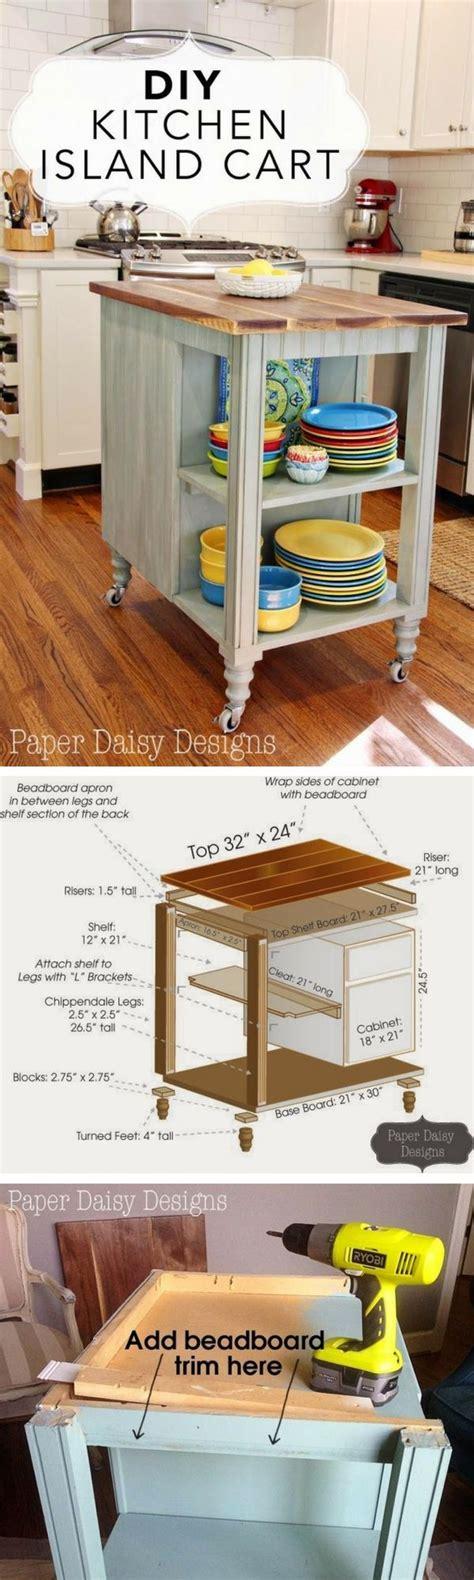 how to tile backsplash kitchen 25 best kitchen island makeover ideas on 7364